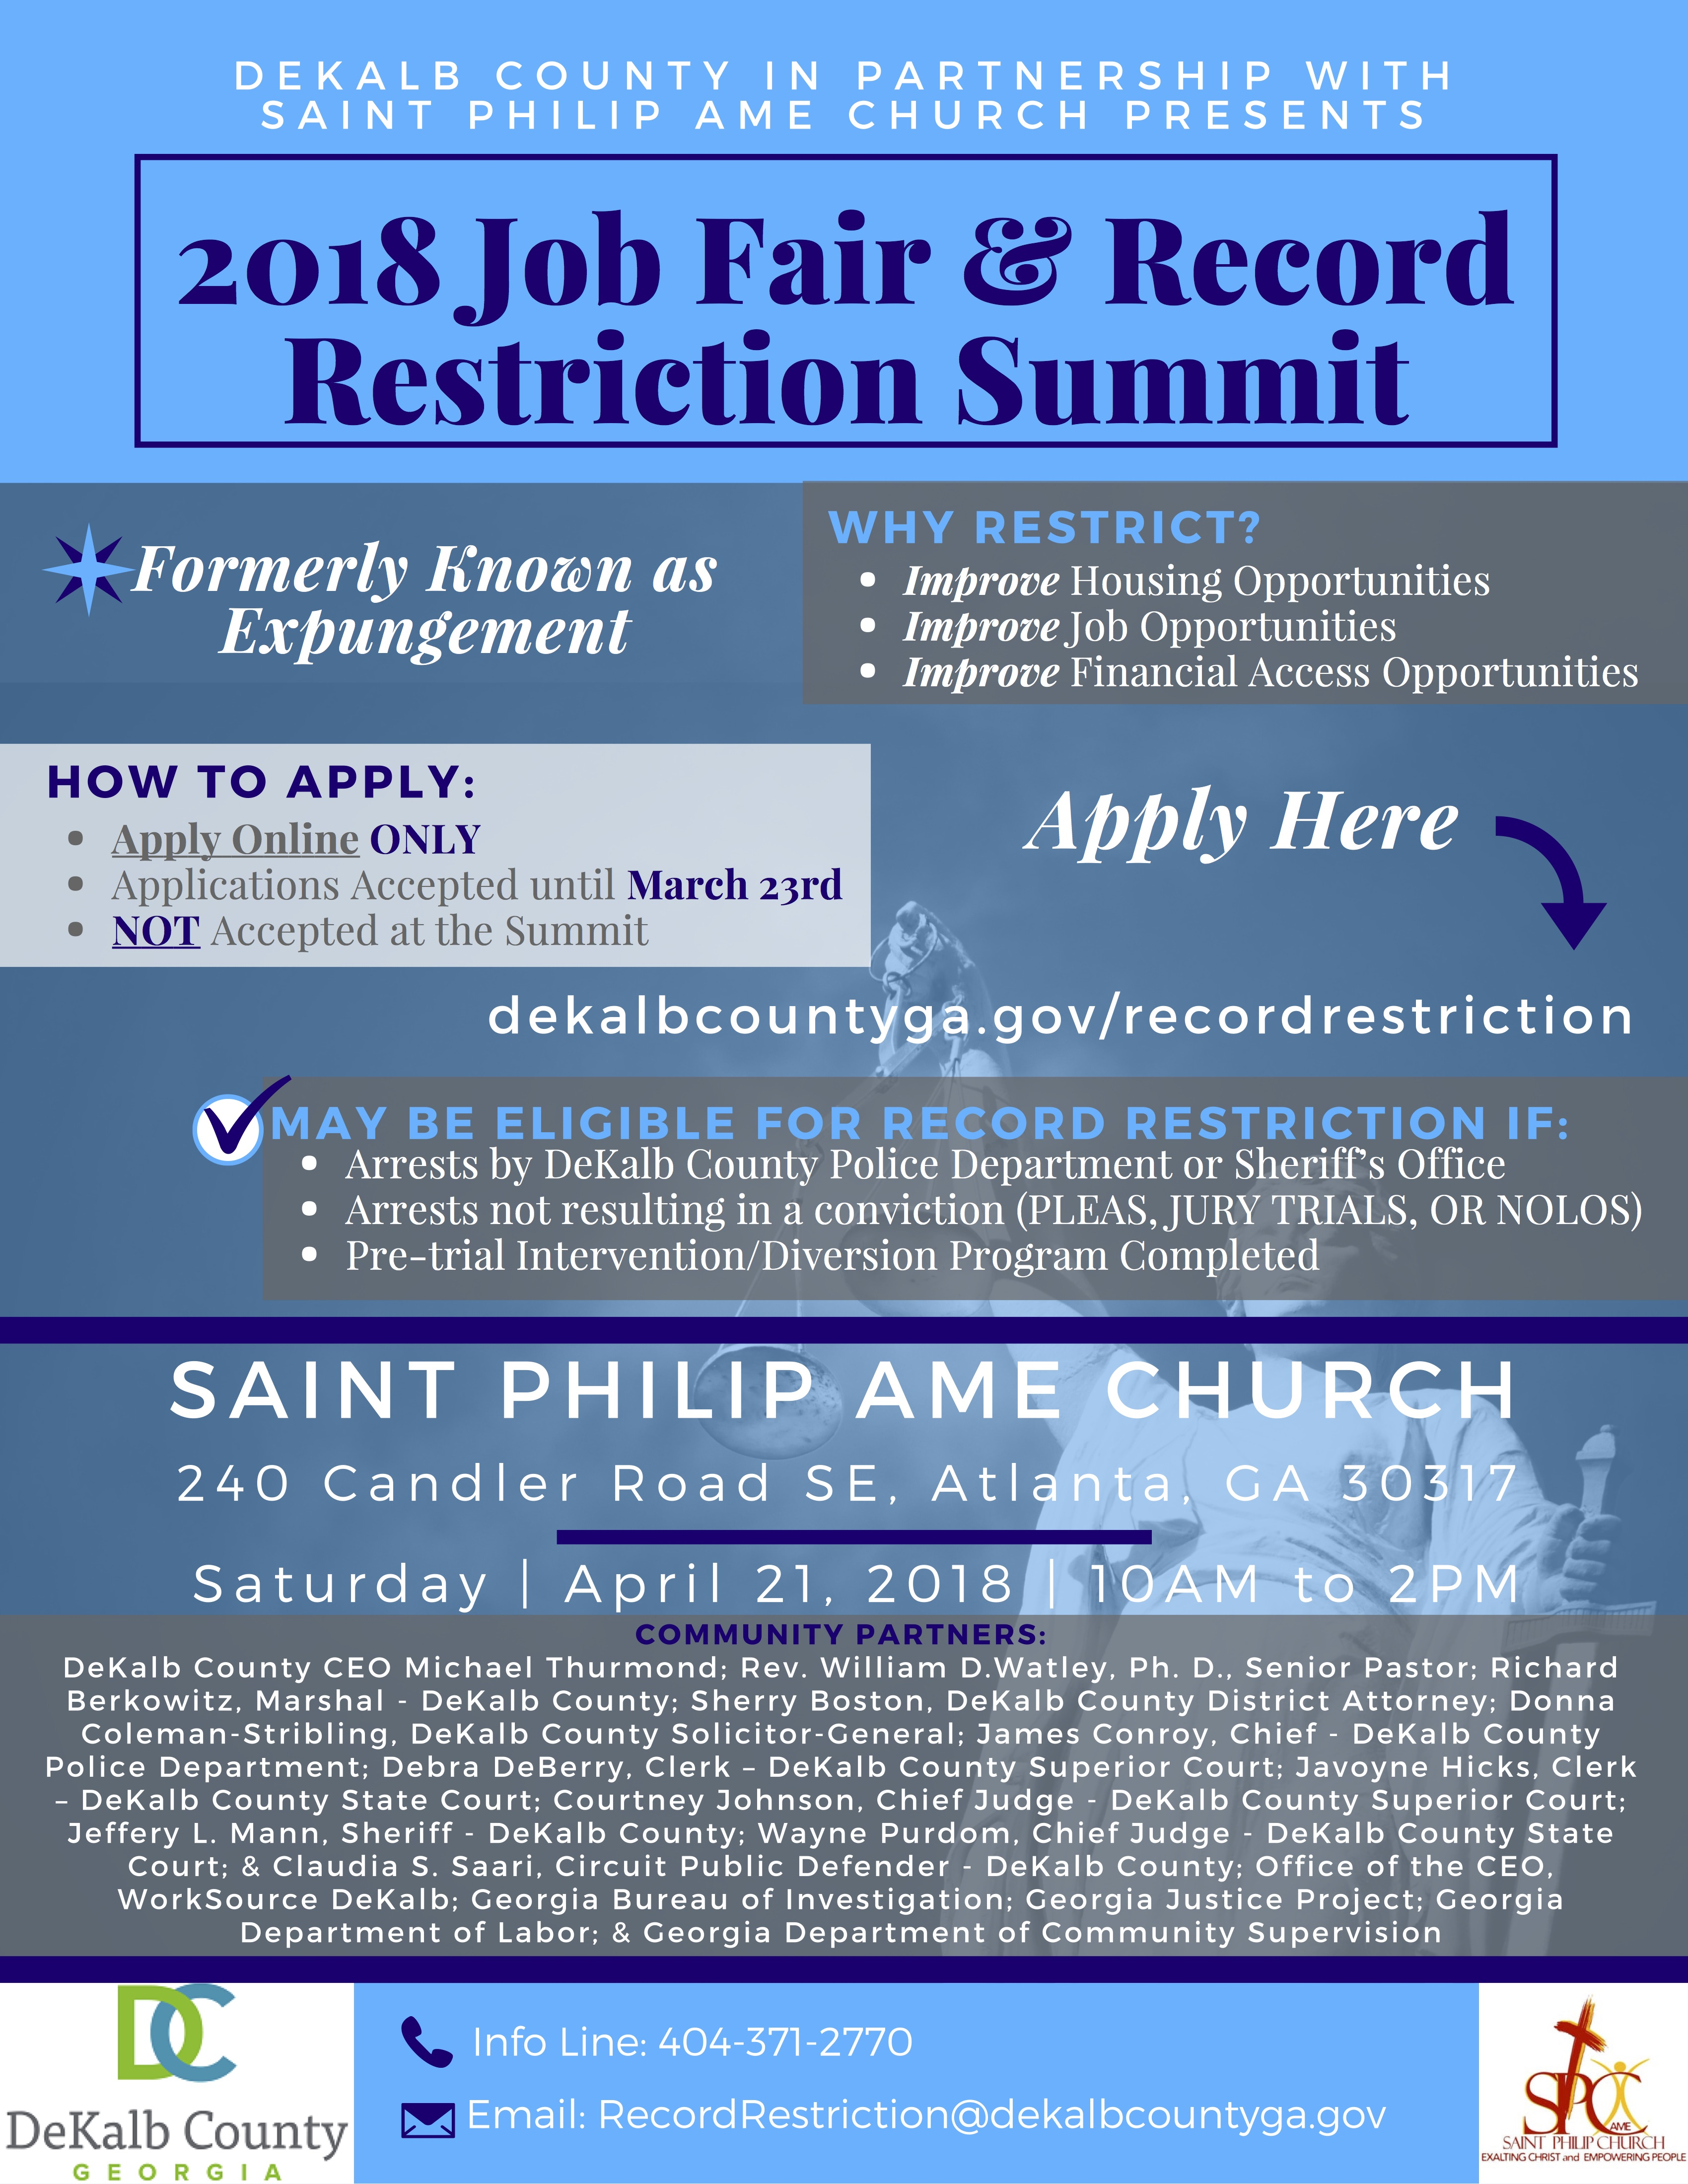 Criminal Record Restriction Summit